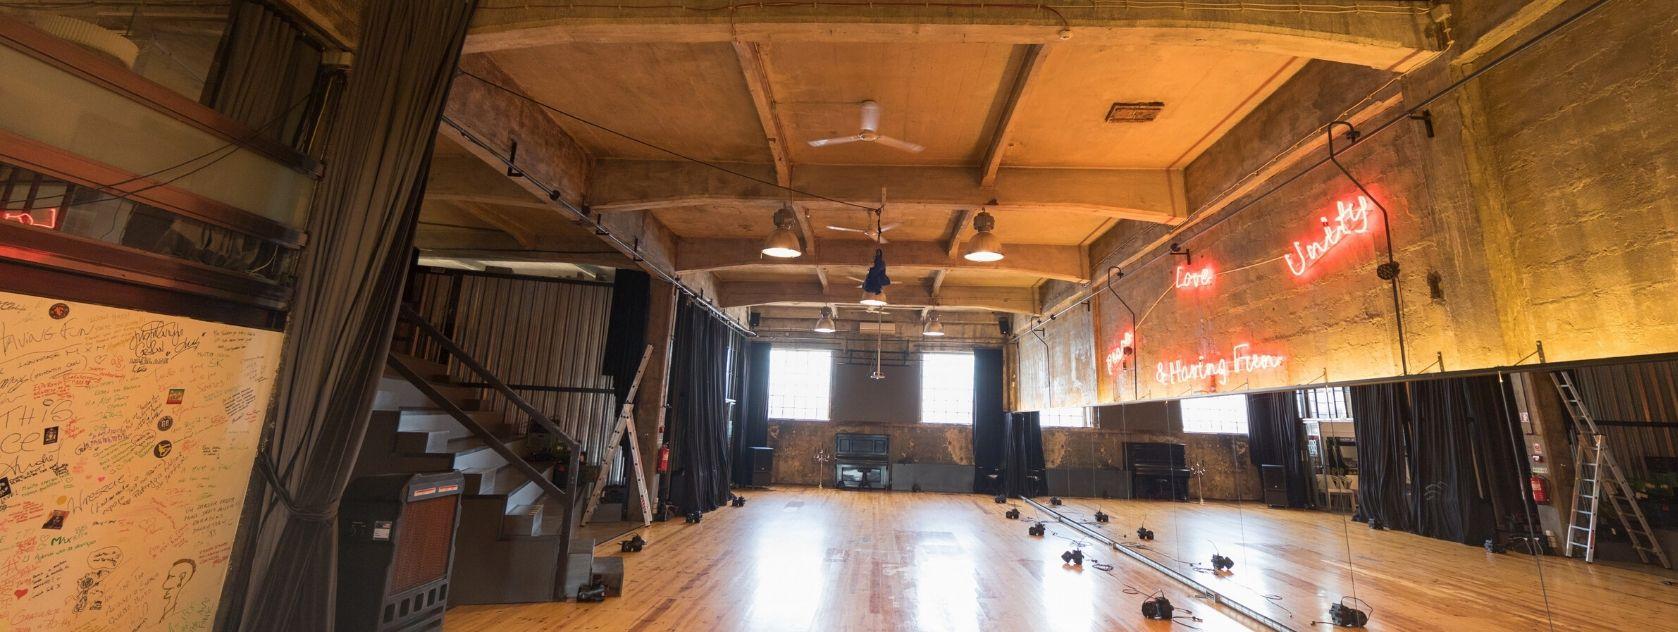 MXM Dance Studio